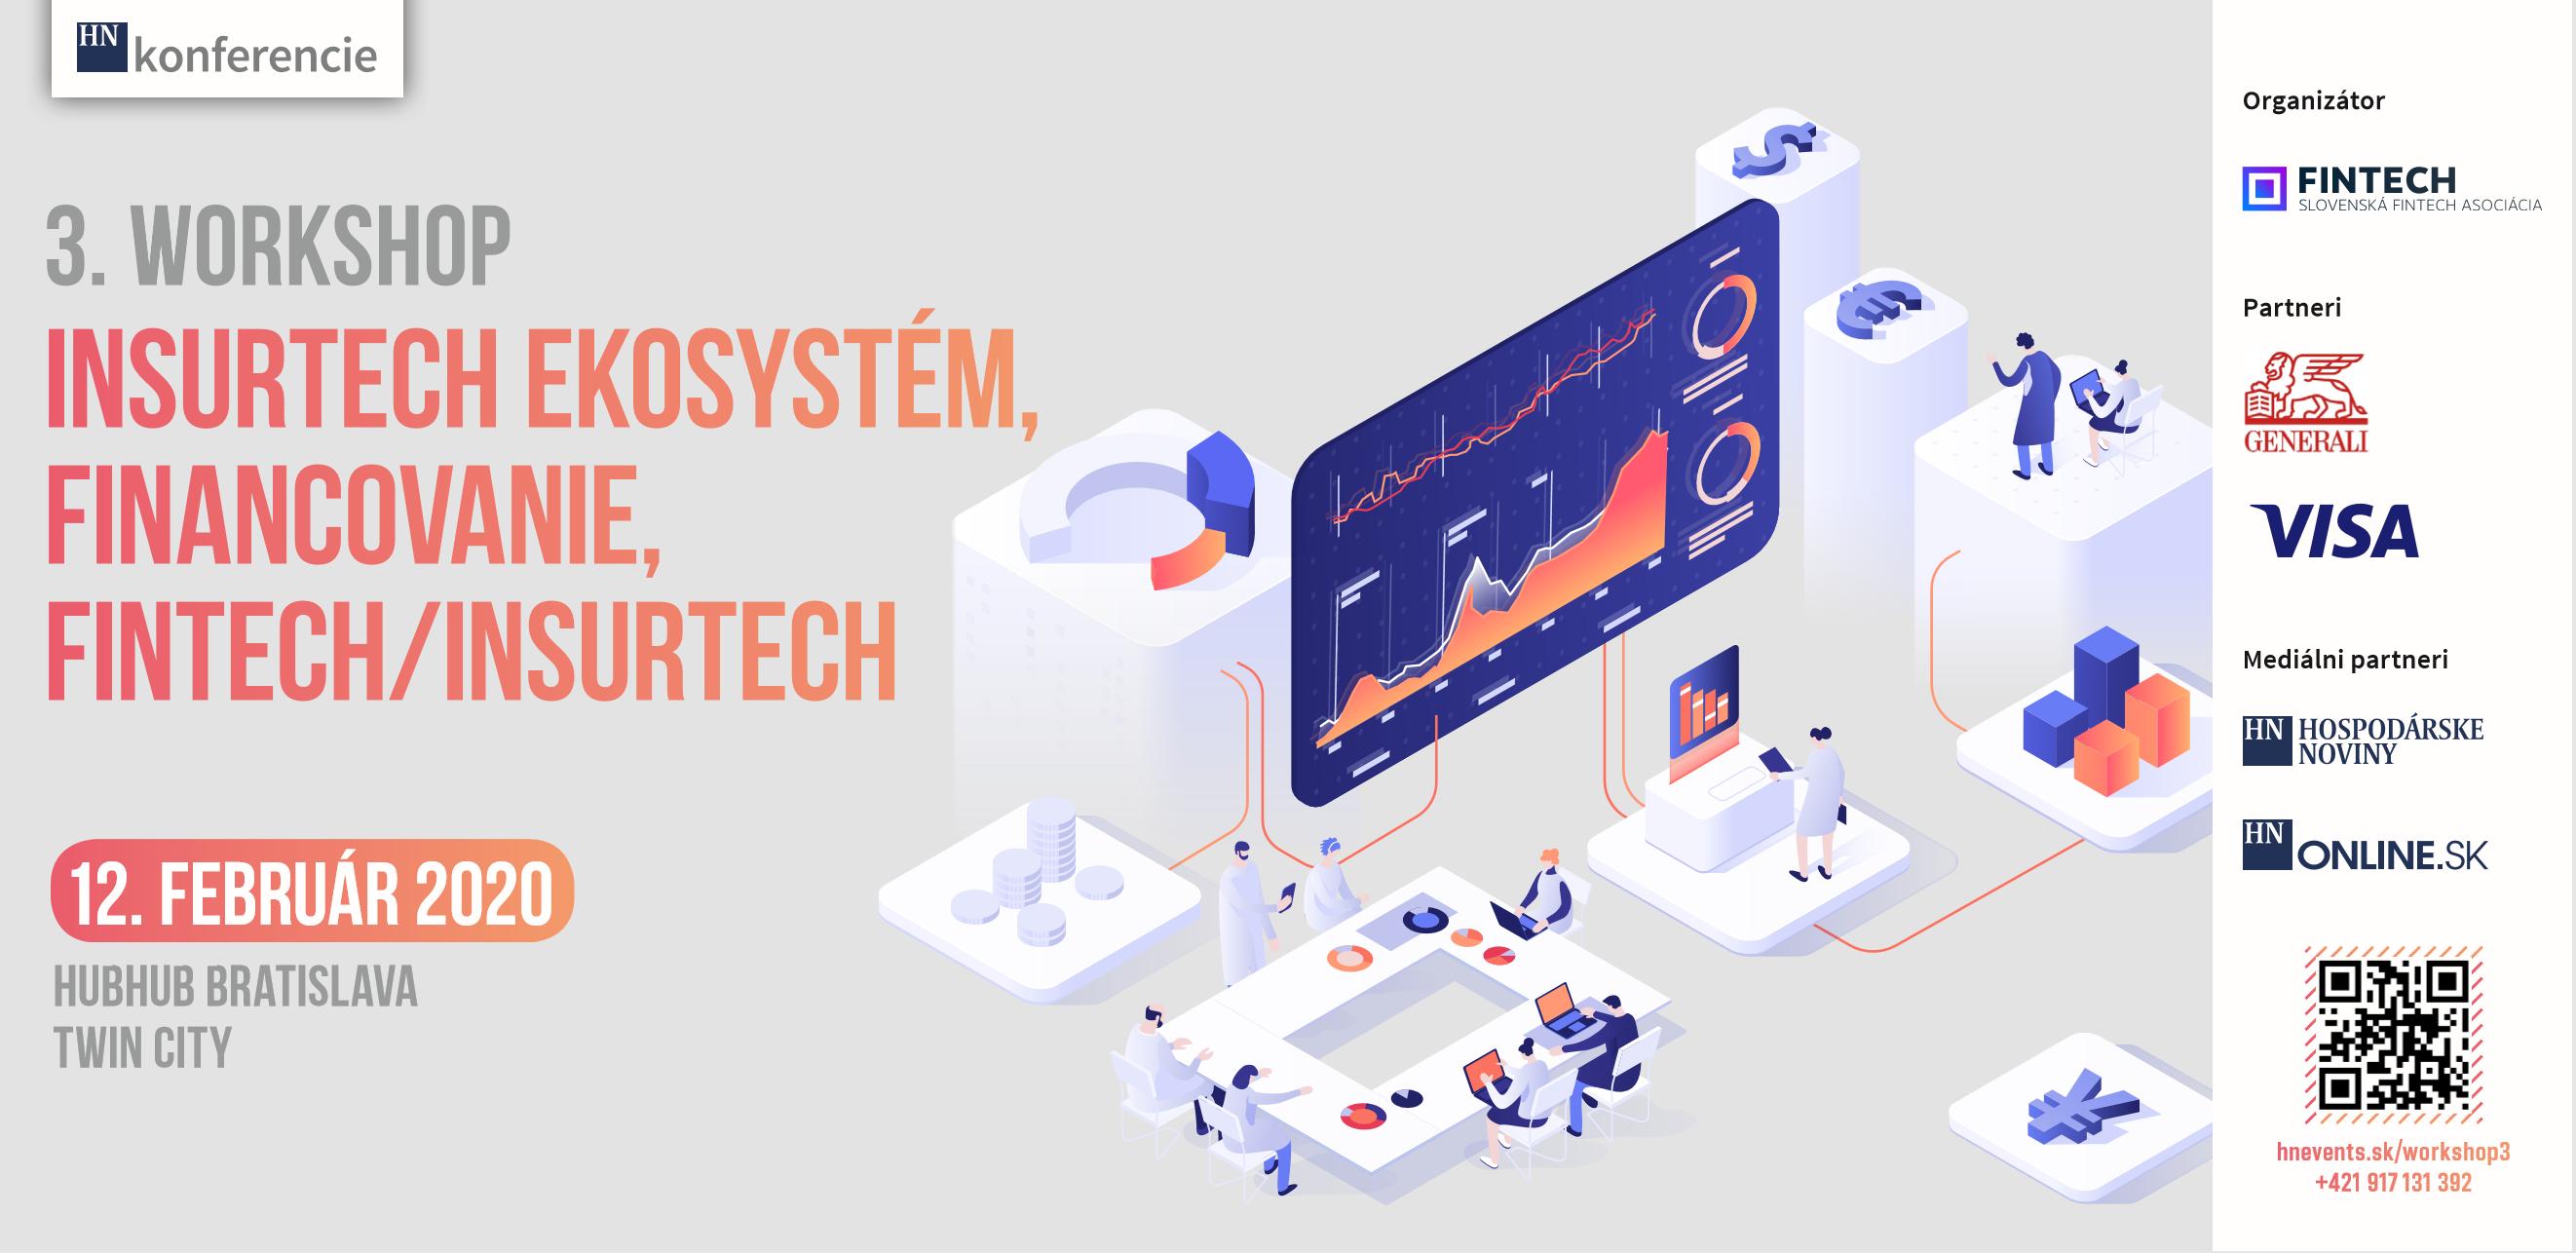 pozvanka na workshop: fintech ekosystem financovanie fintech insurtech 12022020